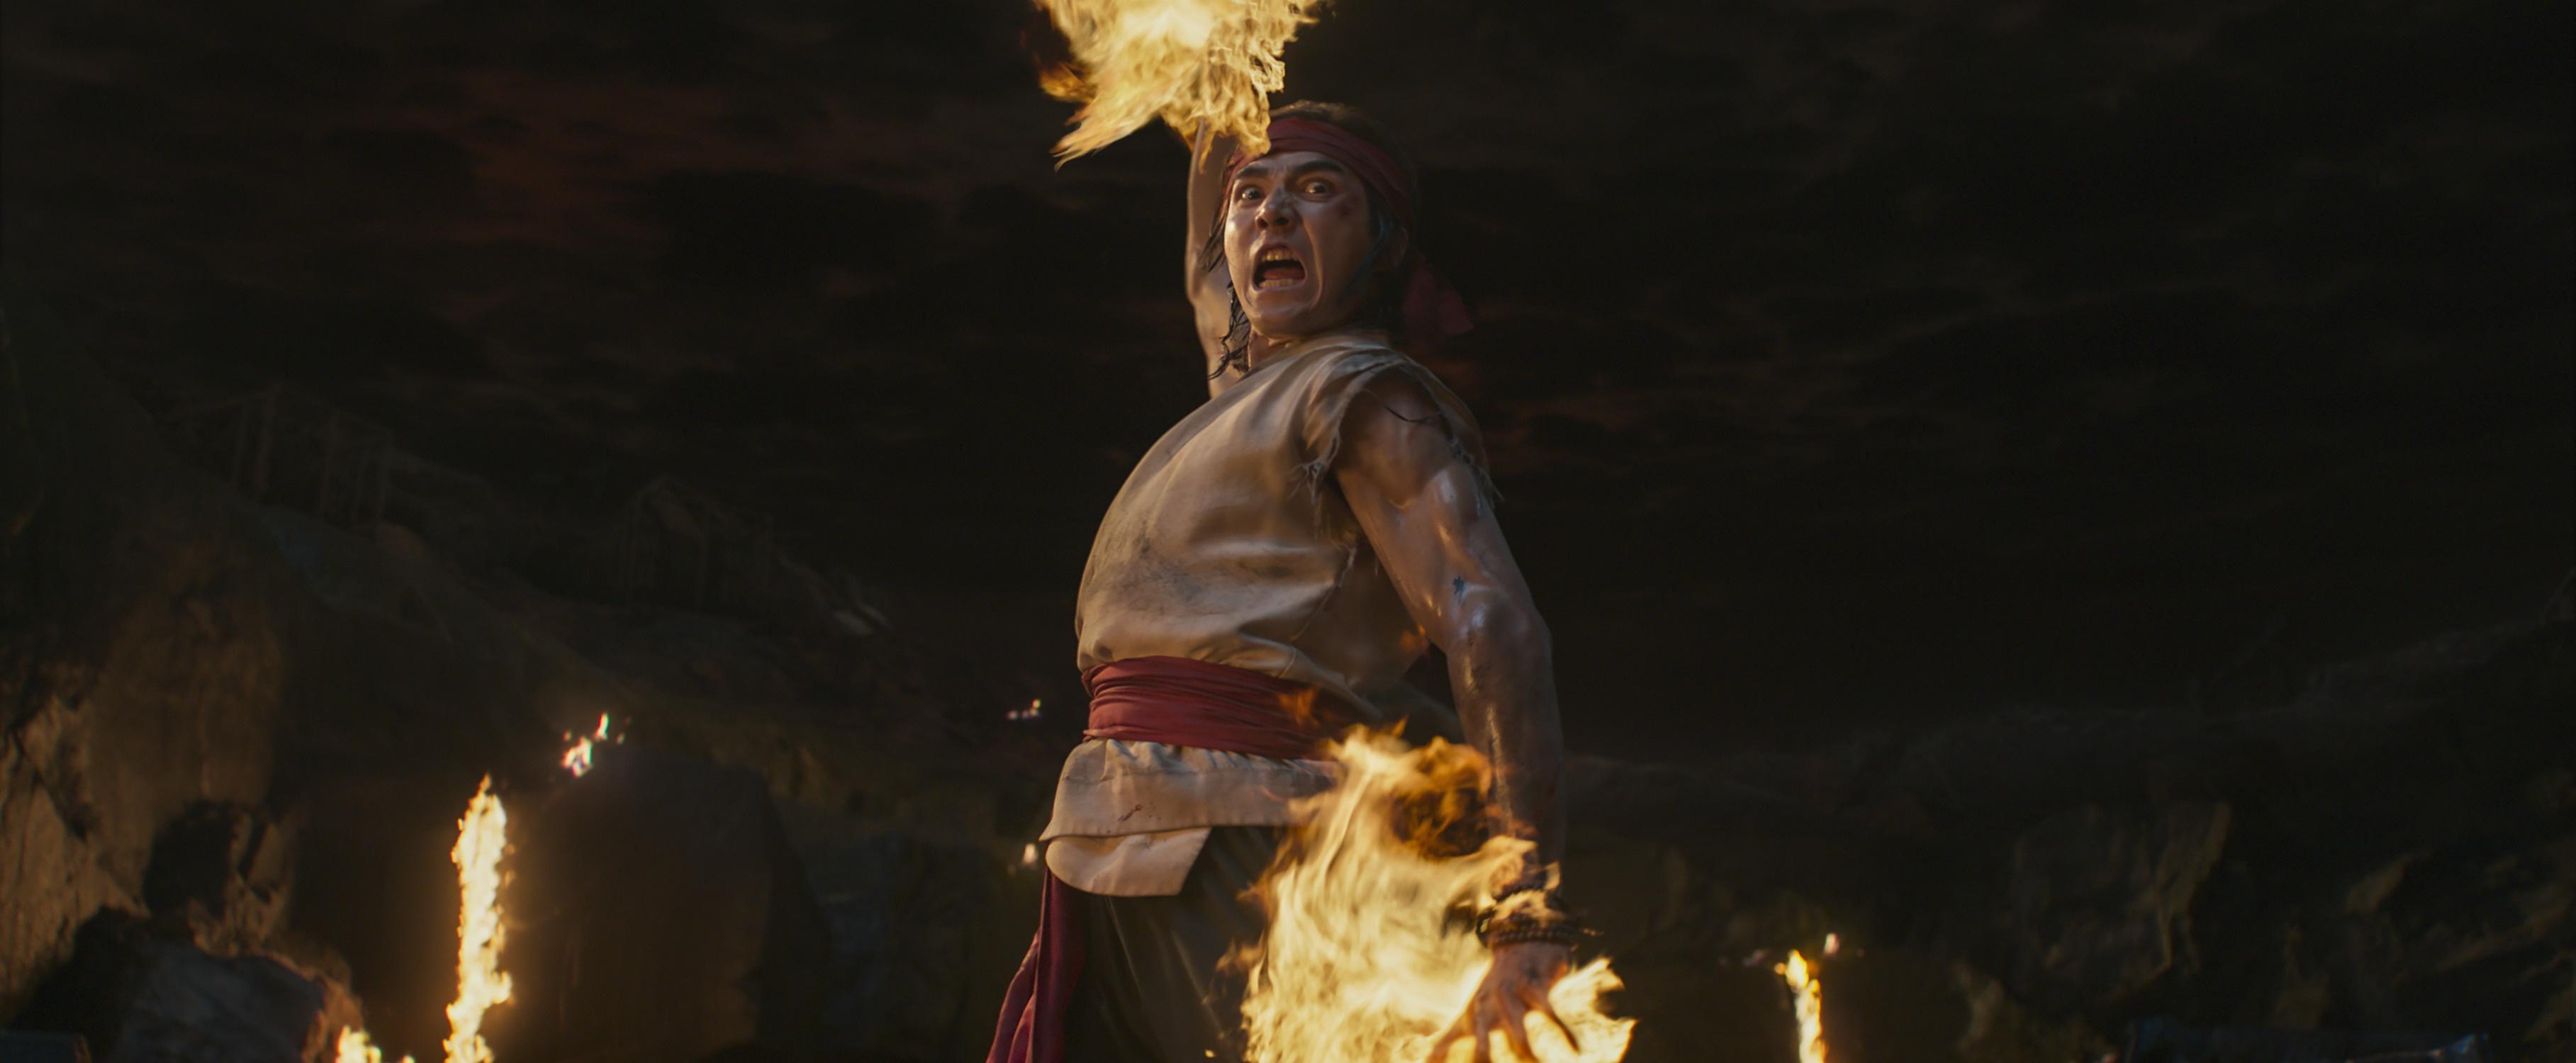 Mortal Kombat recensione film Sky con Lewis Tan e Jessica McNamee